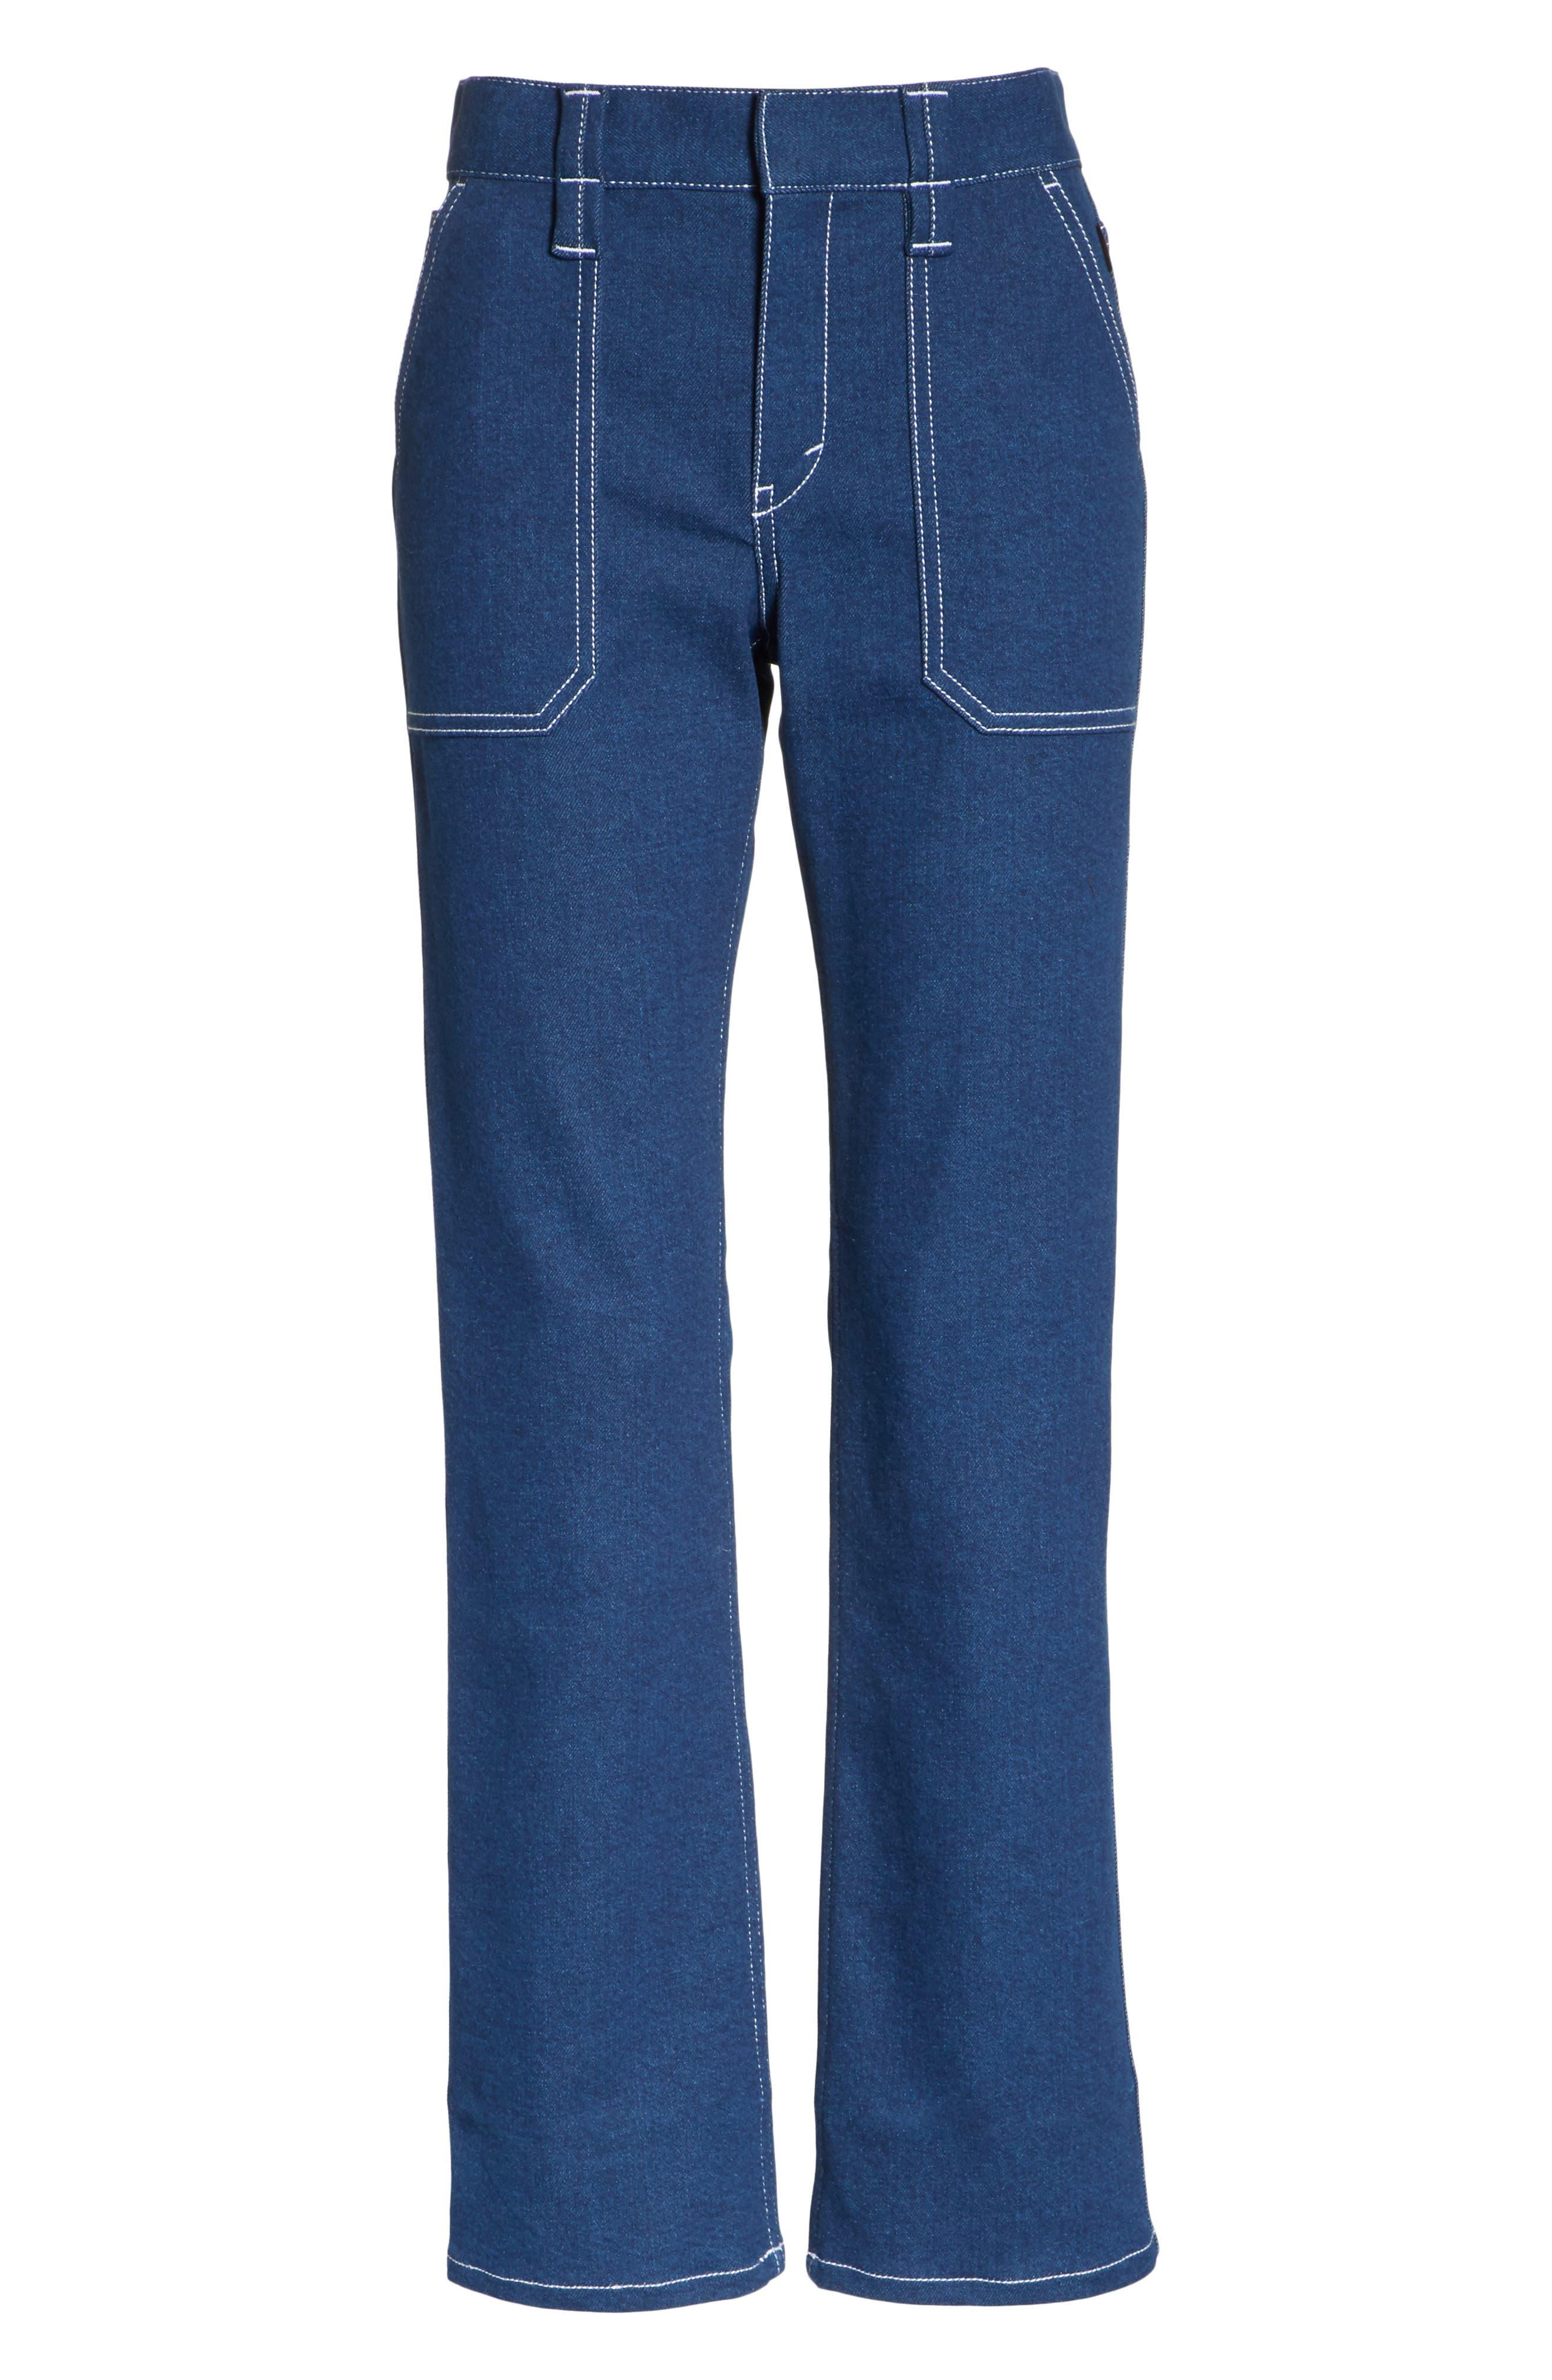 Contrast Circle Stitch Jeans,                             Alternate thumbnail 6, color,                             400